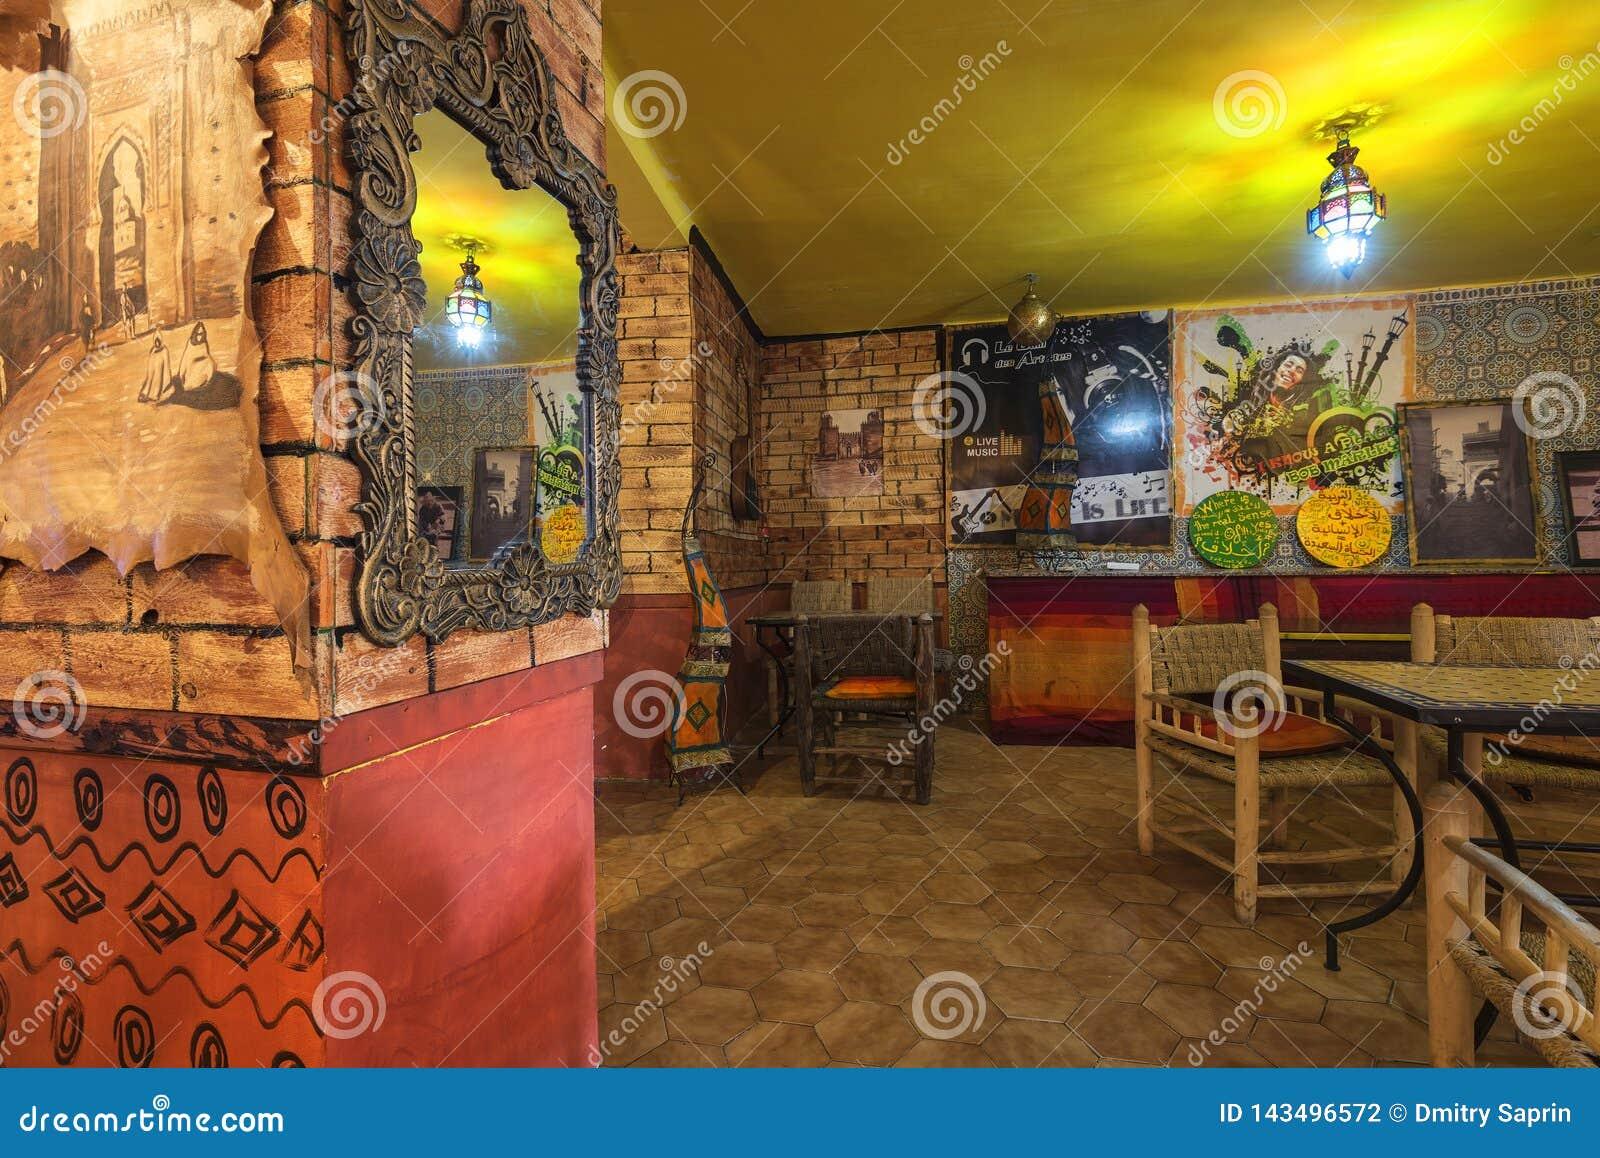 Moroccan Restaurant Interior Editorial Photography Image Of Architecture Interior 143496572